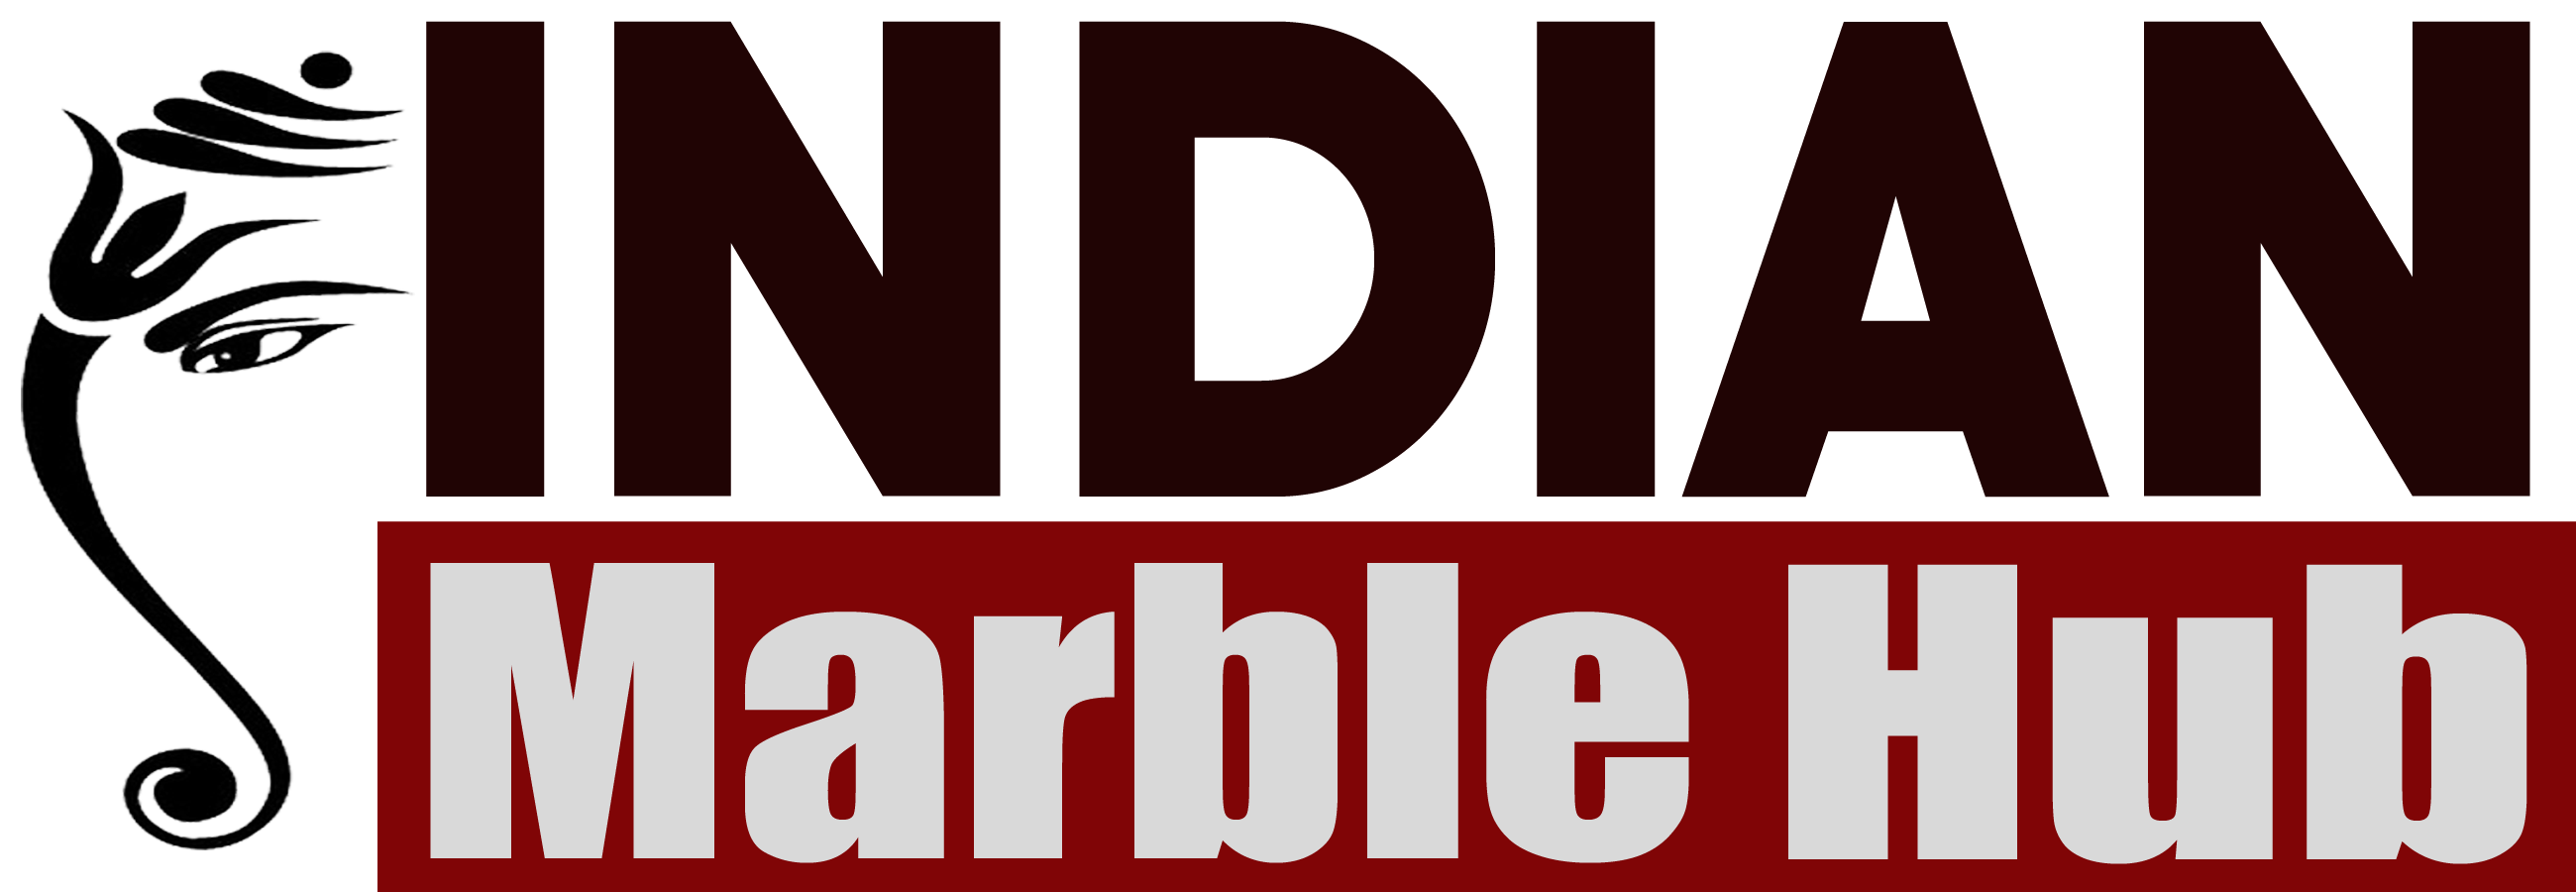 Indian Marble Hub Blog